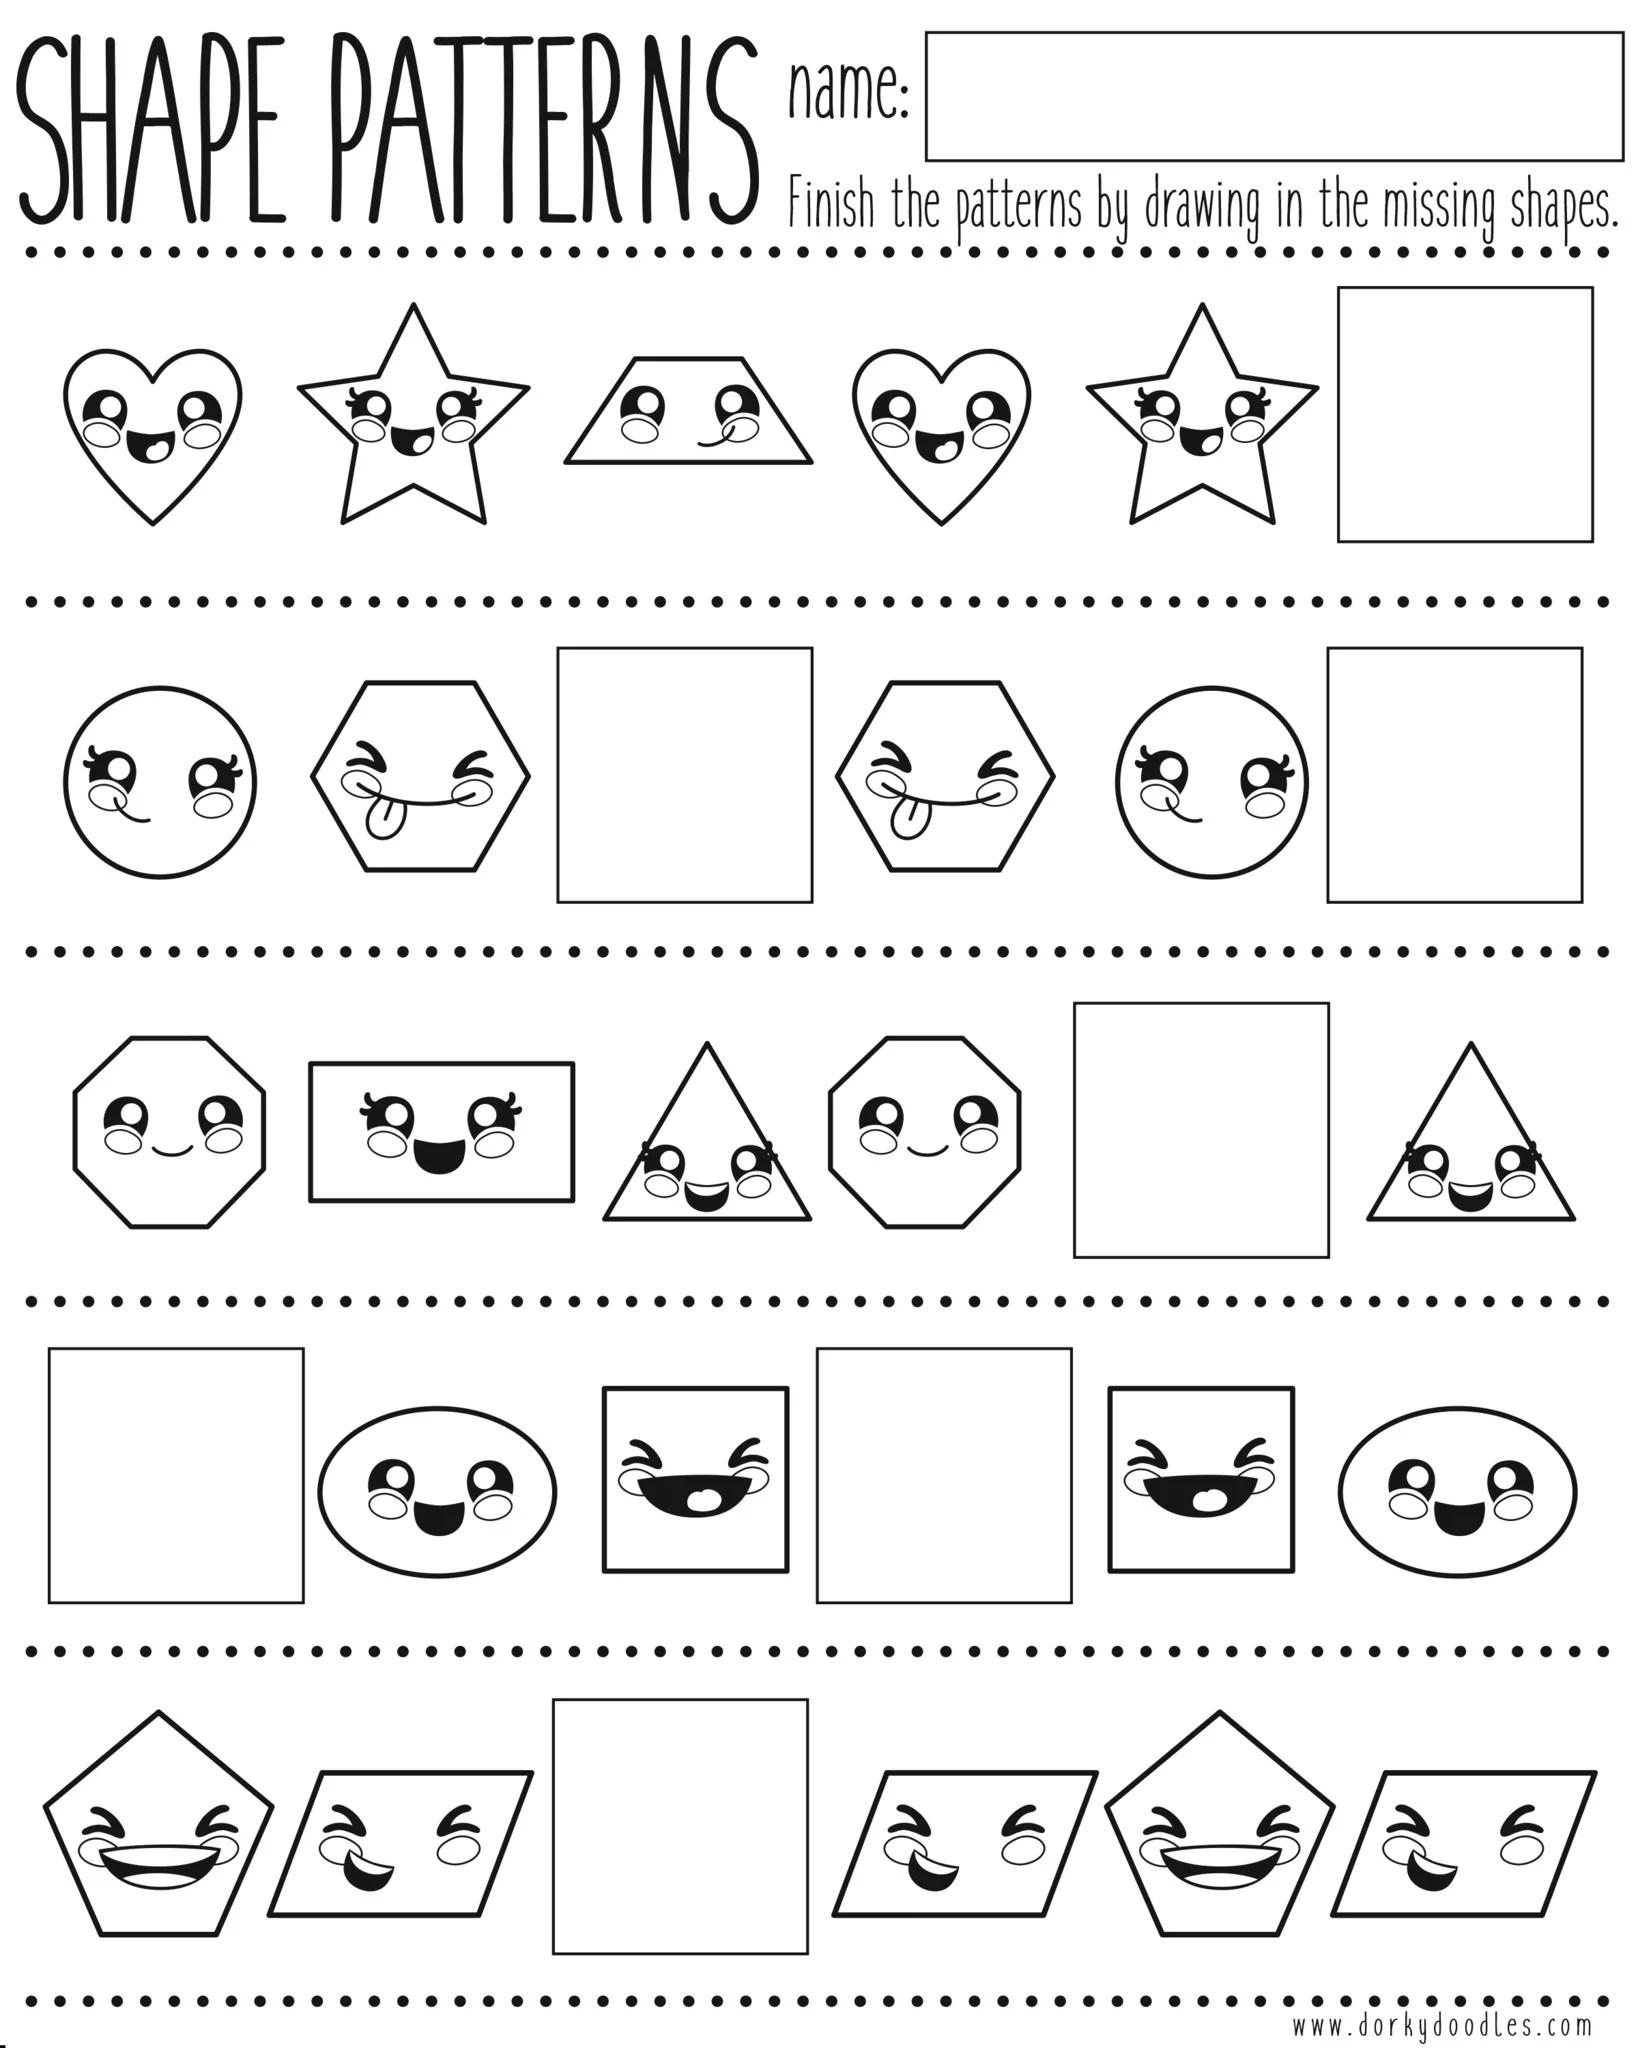 Shapes and Pattern Practice Printable Worksheet – Dorky Doodles [ 2048 x 1638 Pixel ]